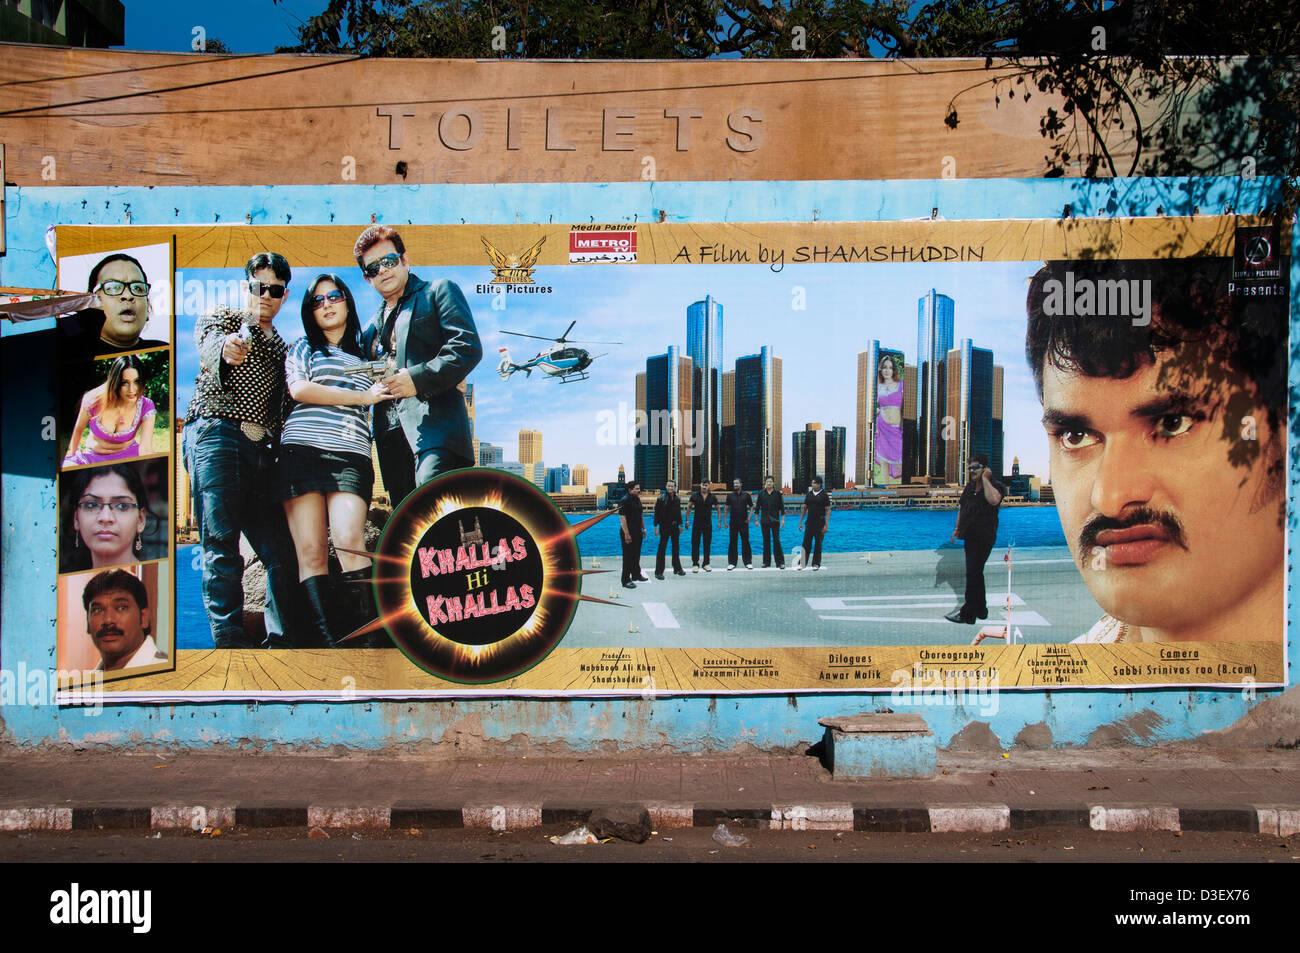 Khallas film Hallo Kallas durch Shamshuddin Bollywood Mumbai Indien Film Film Bilder Filme Stockbild